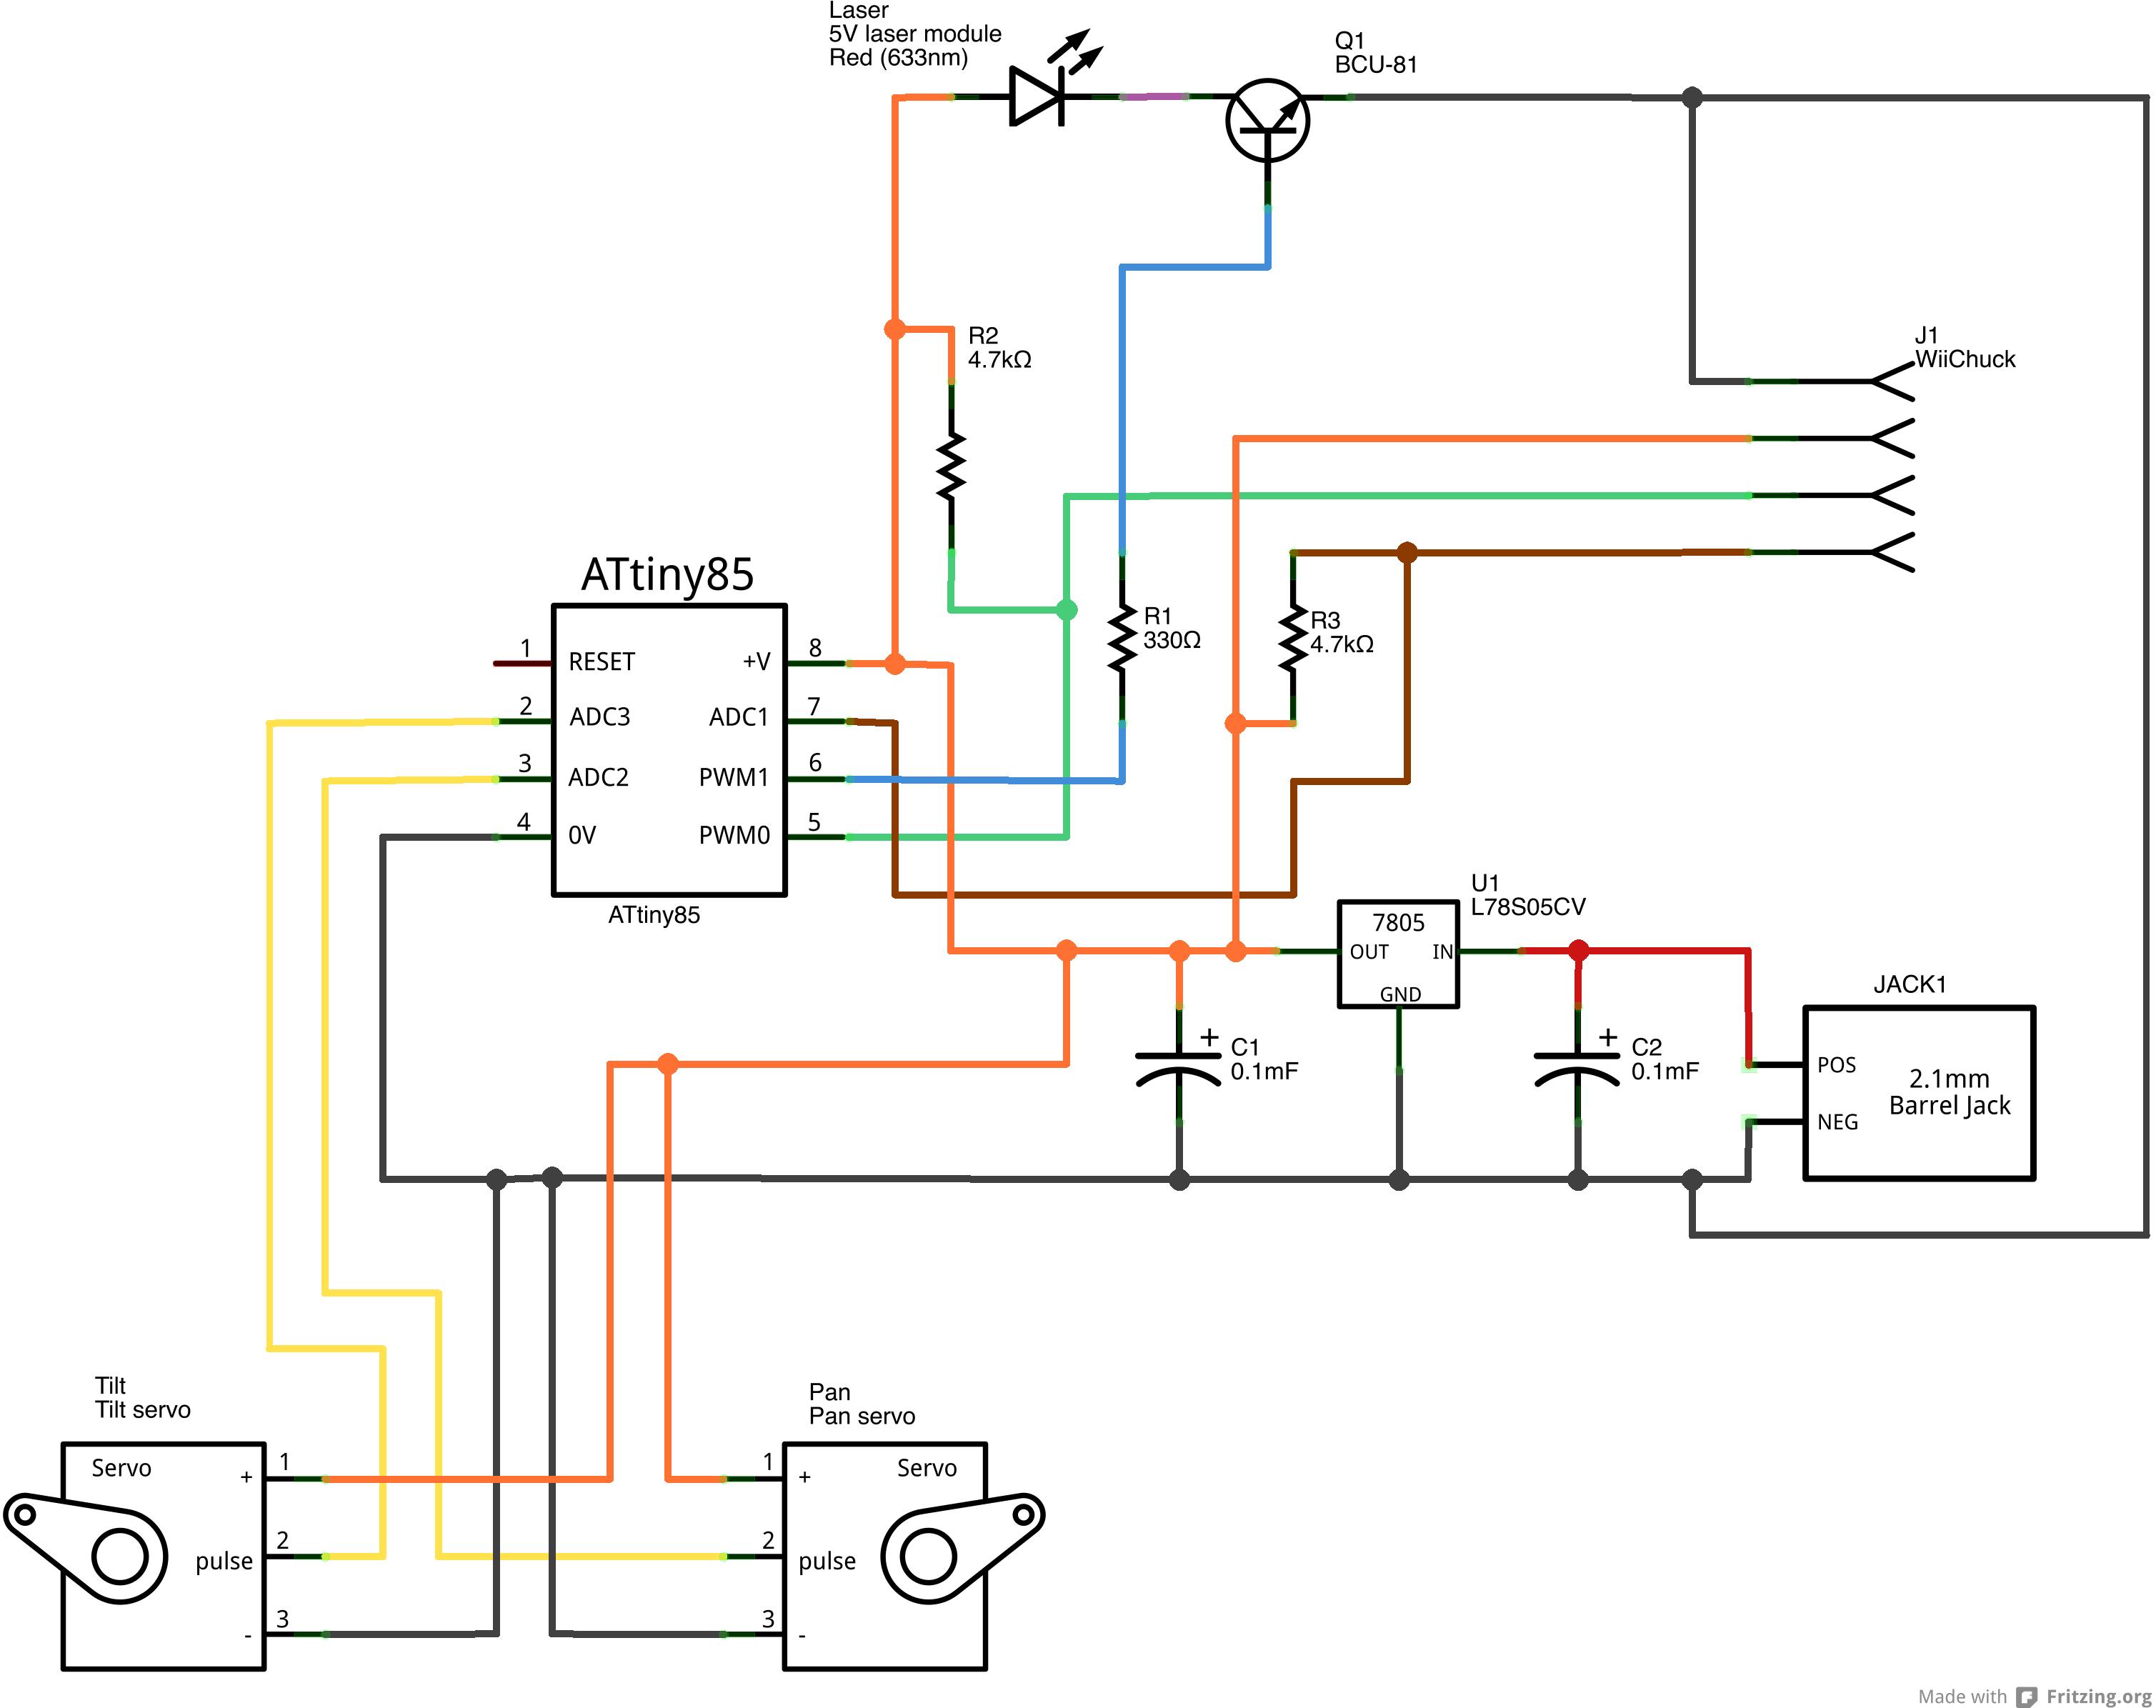 18057f20e1f0f1fe368f37ff7301020b tinylaserturret an attiny85, a laser module, a wii nunchuck, and wii nunchuck wiring diagram at soozxer.org